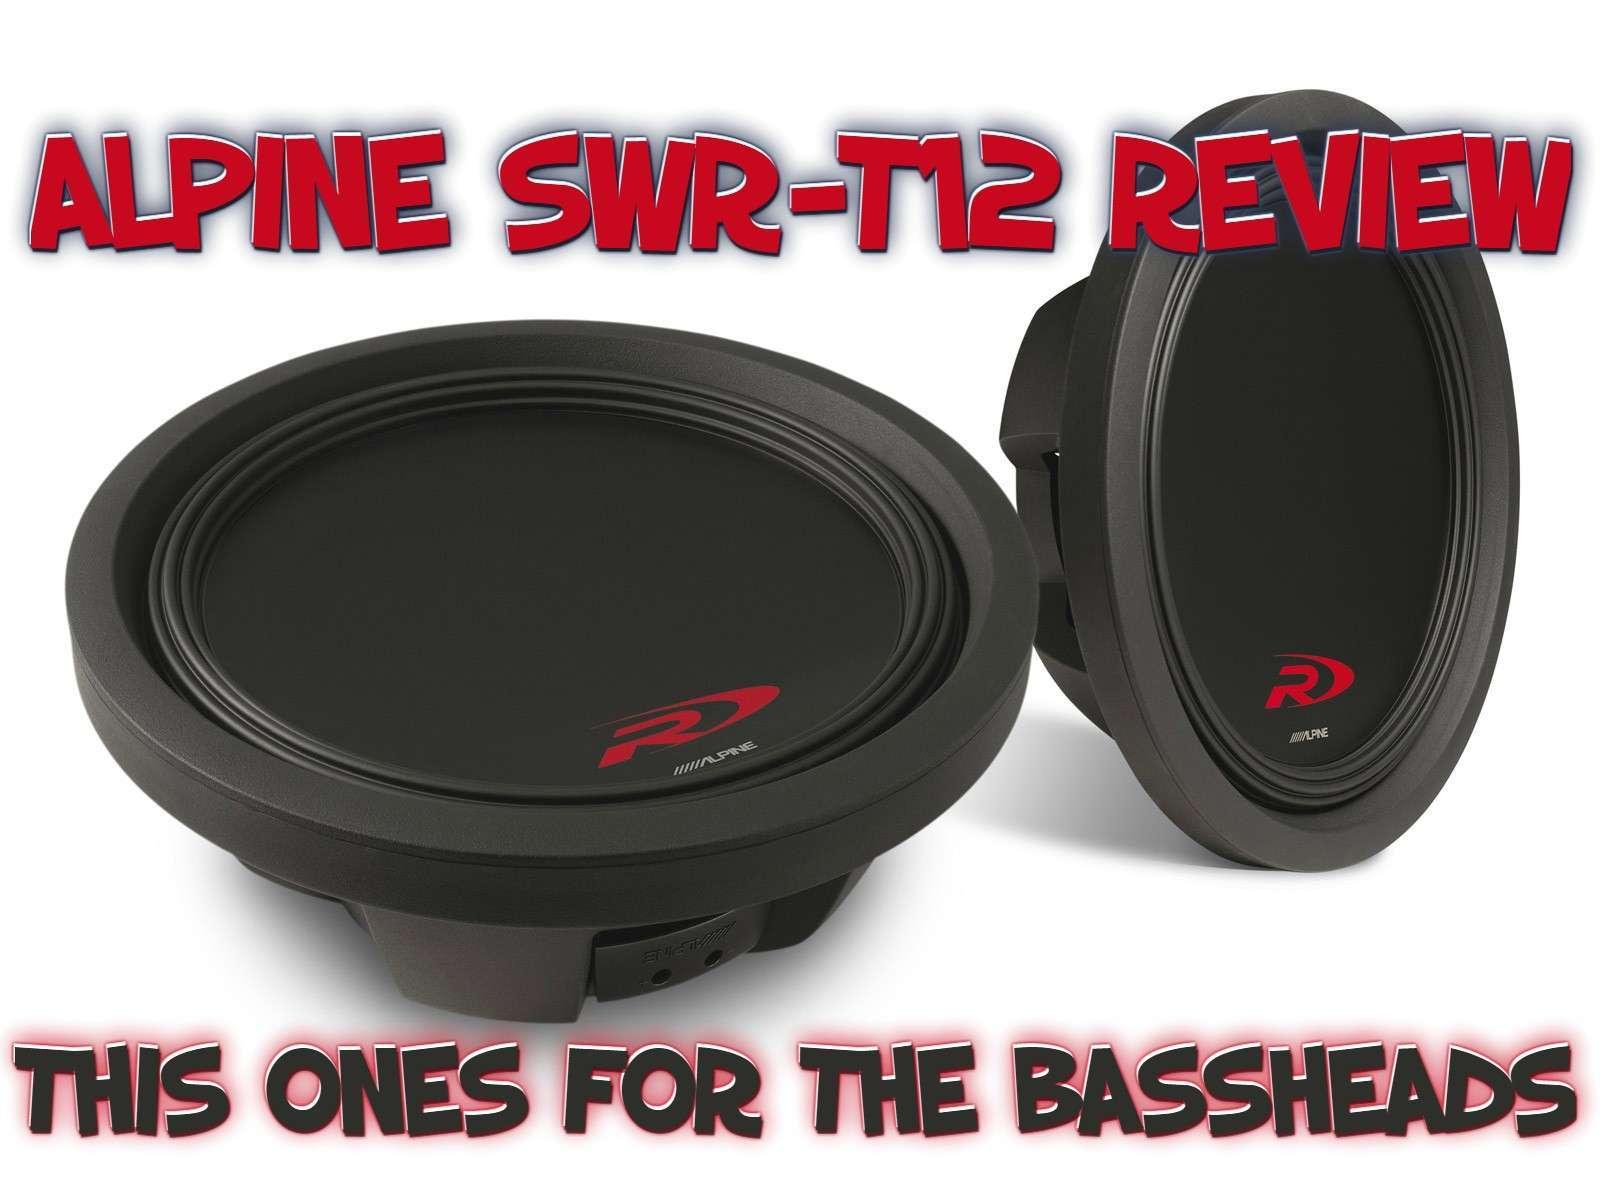 Alpine SWR-T12 Review